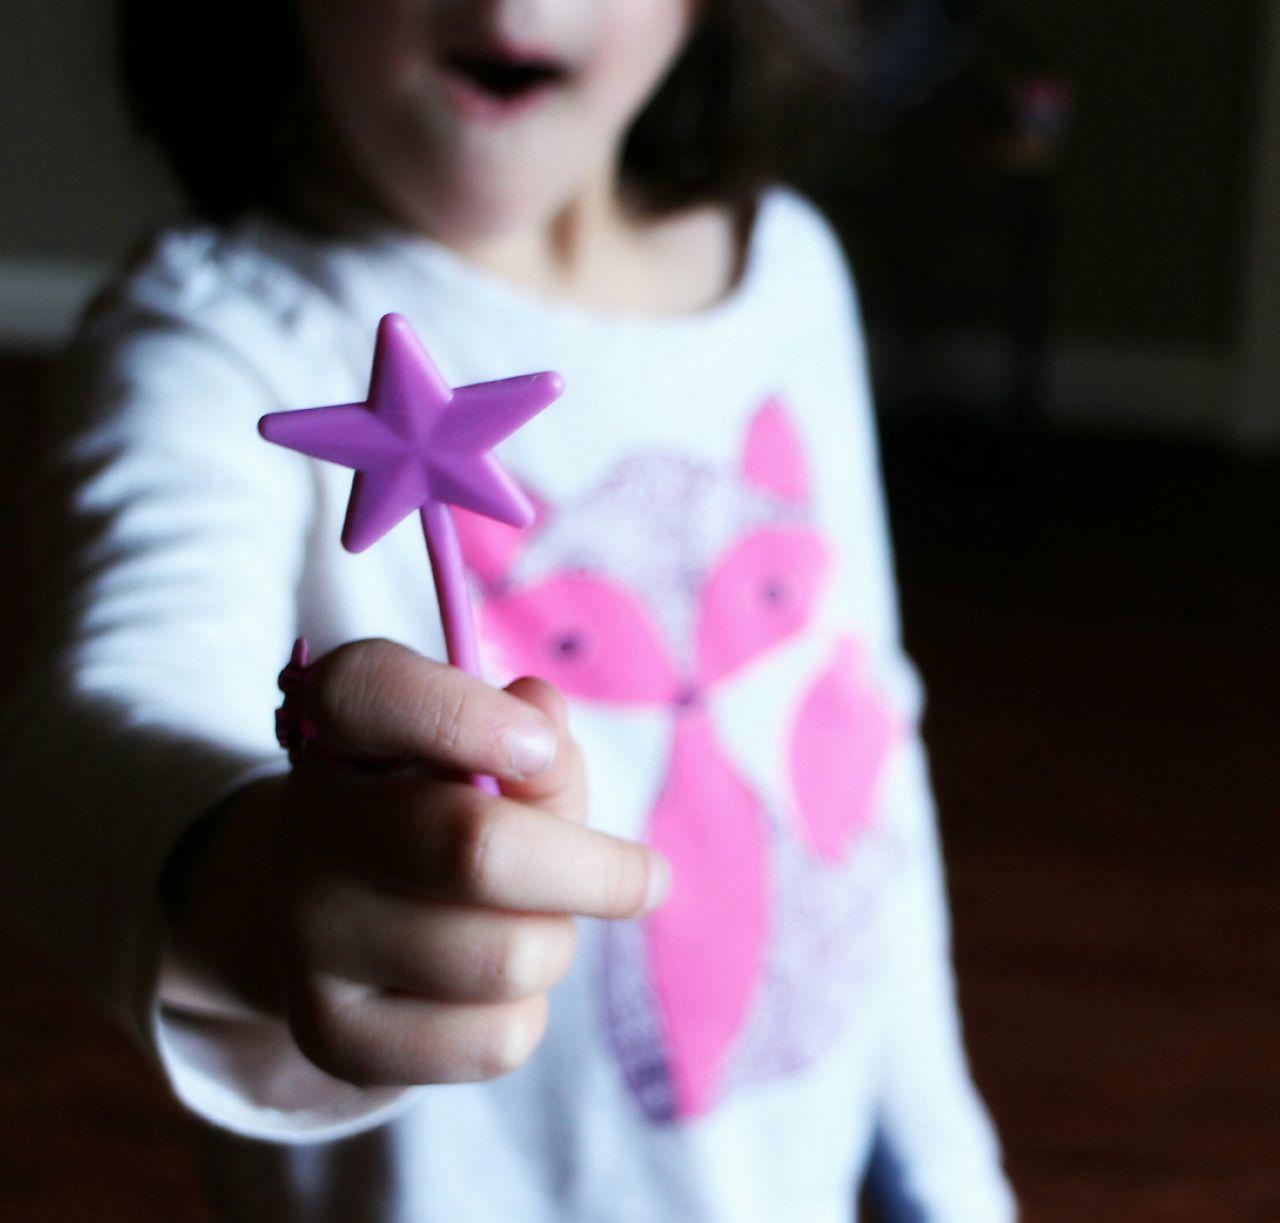 Kids Joy Magic Magic Wand Play Imagination